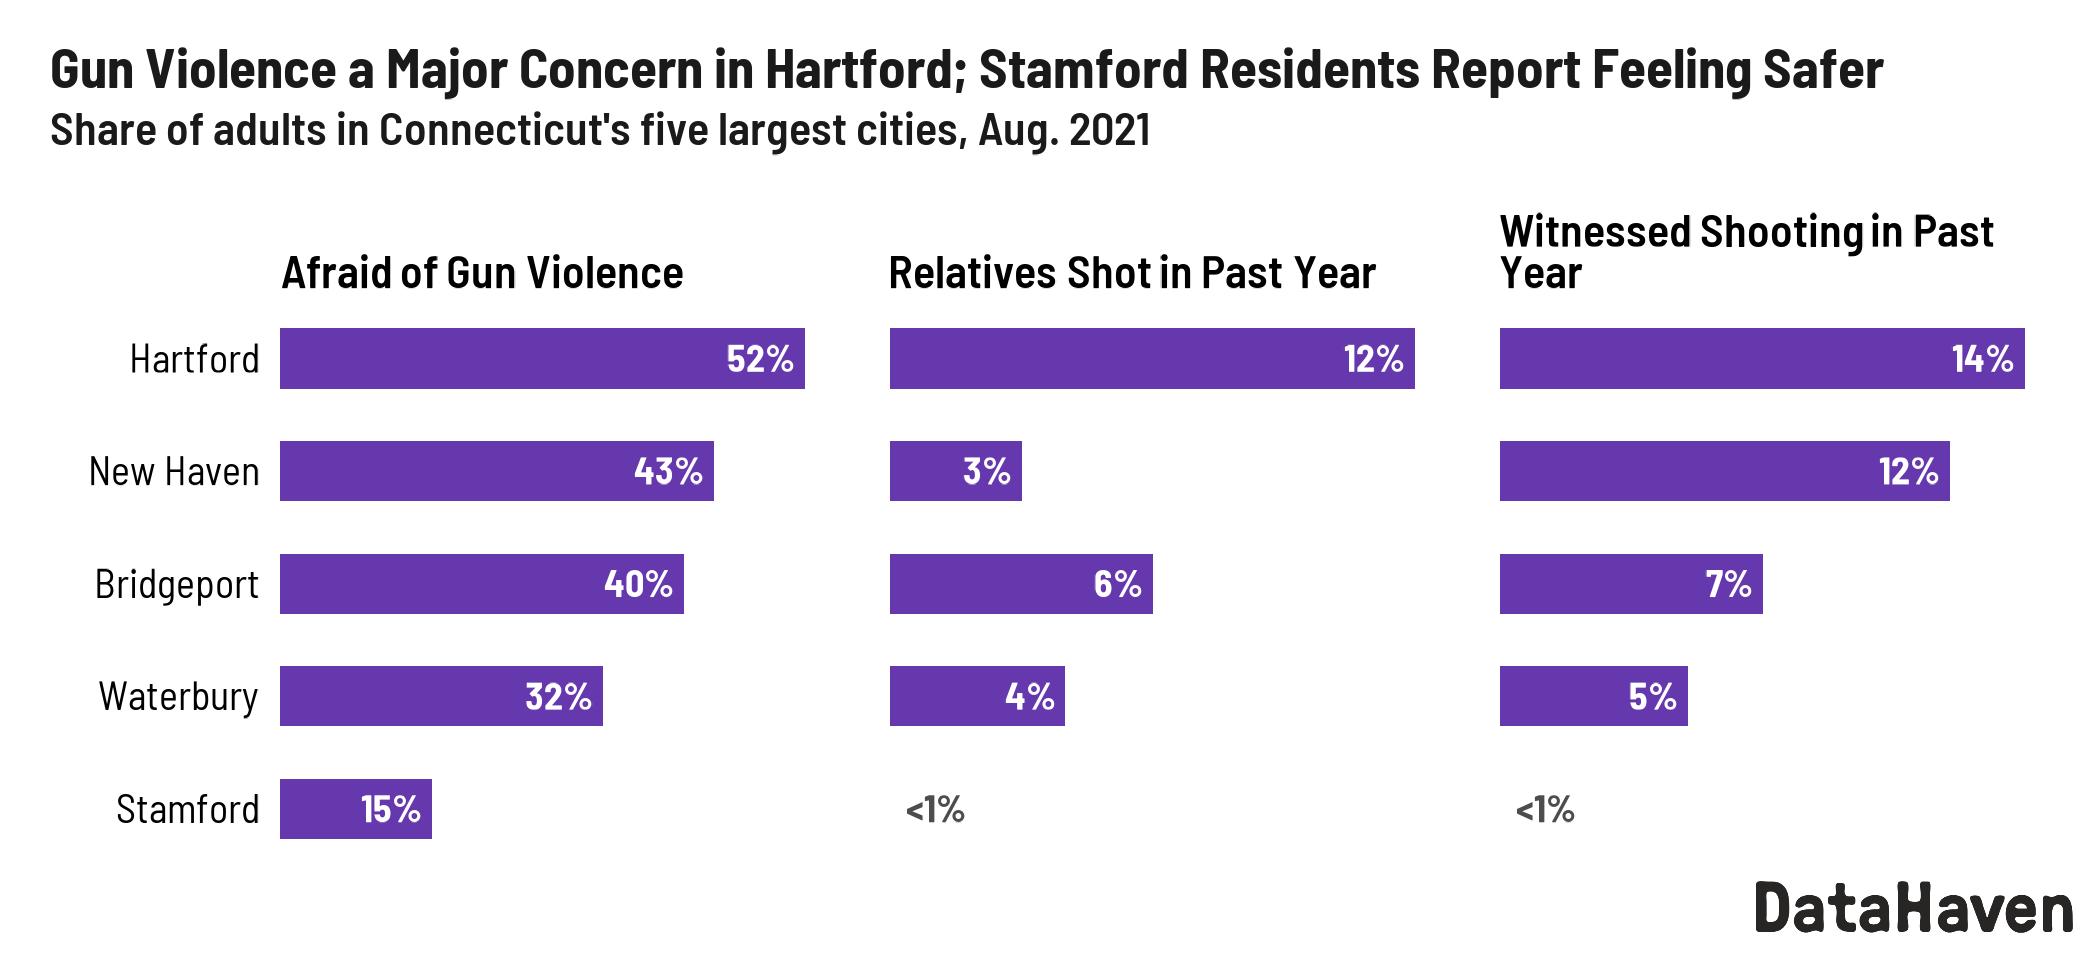 gun violence ct cities measured by DataHaven 2021 Connecticut Survey